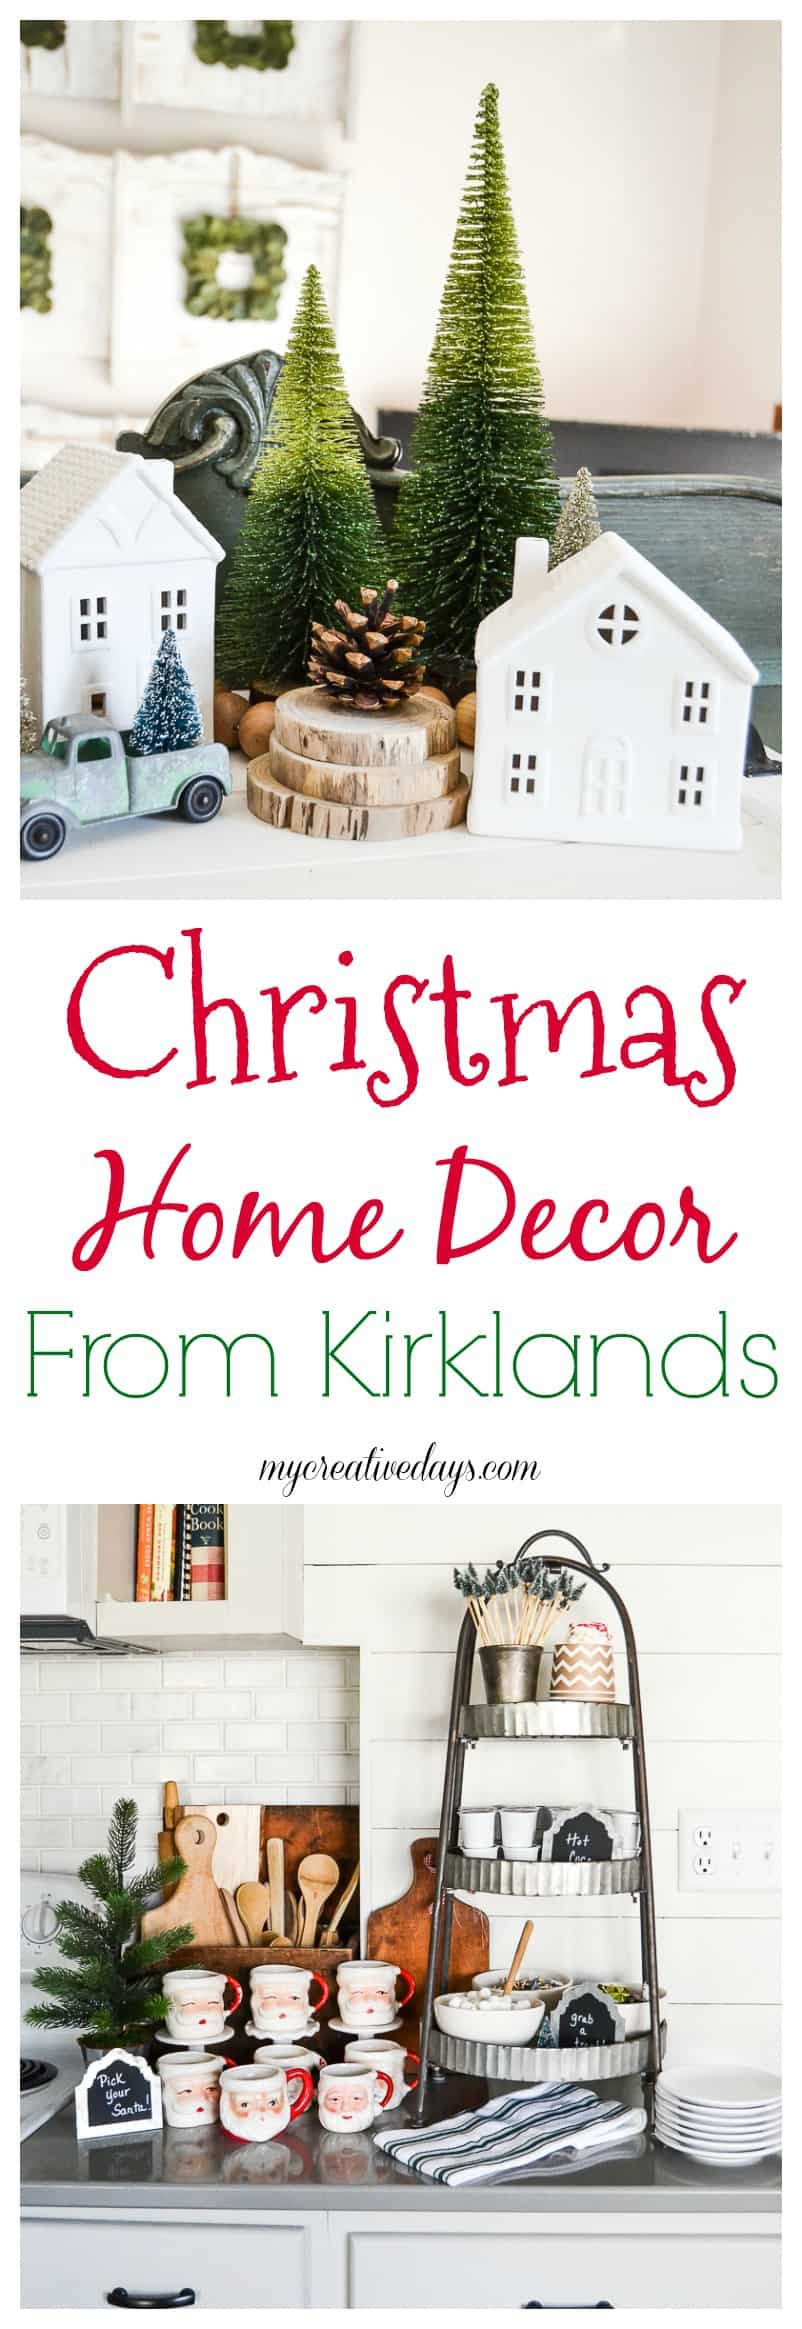 Christmas Home Decor From Kirklands - My Creative Days